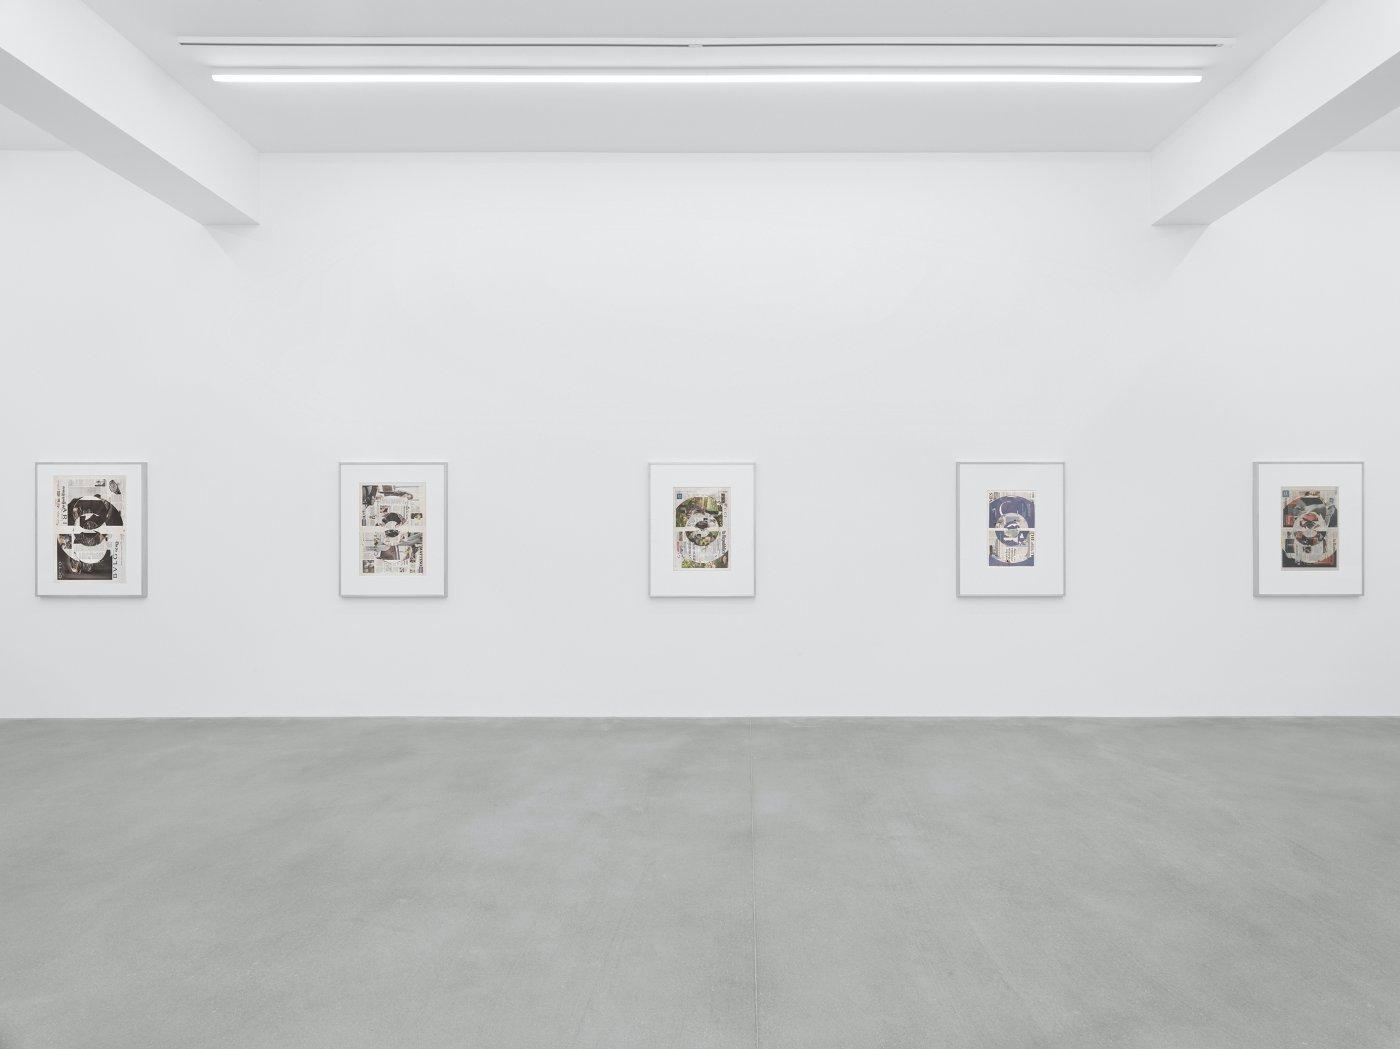 Galerie Eva Presenhuber Waldmanstrasse Walead Beshty 7